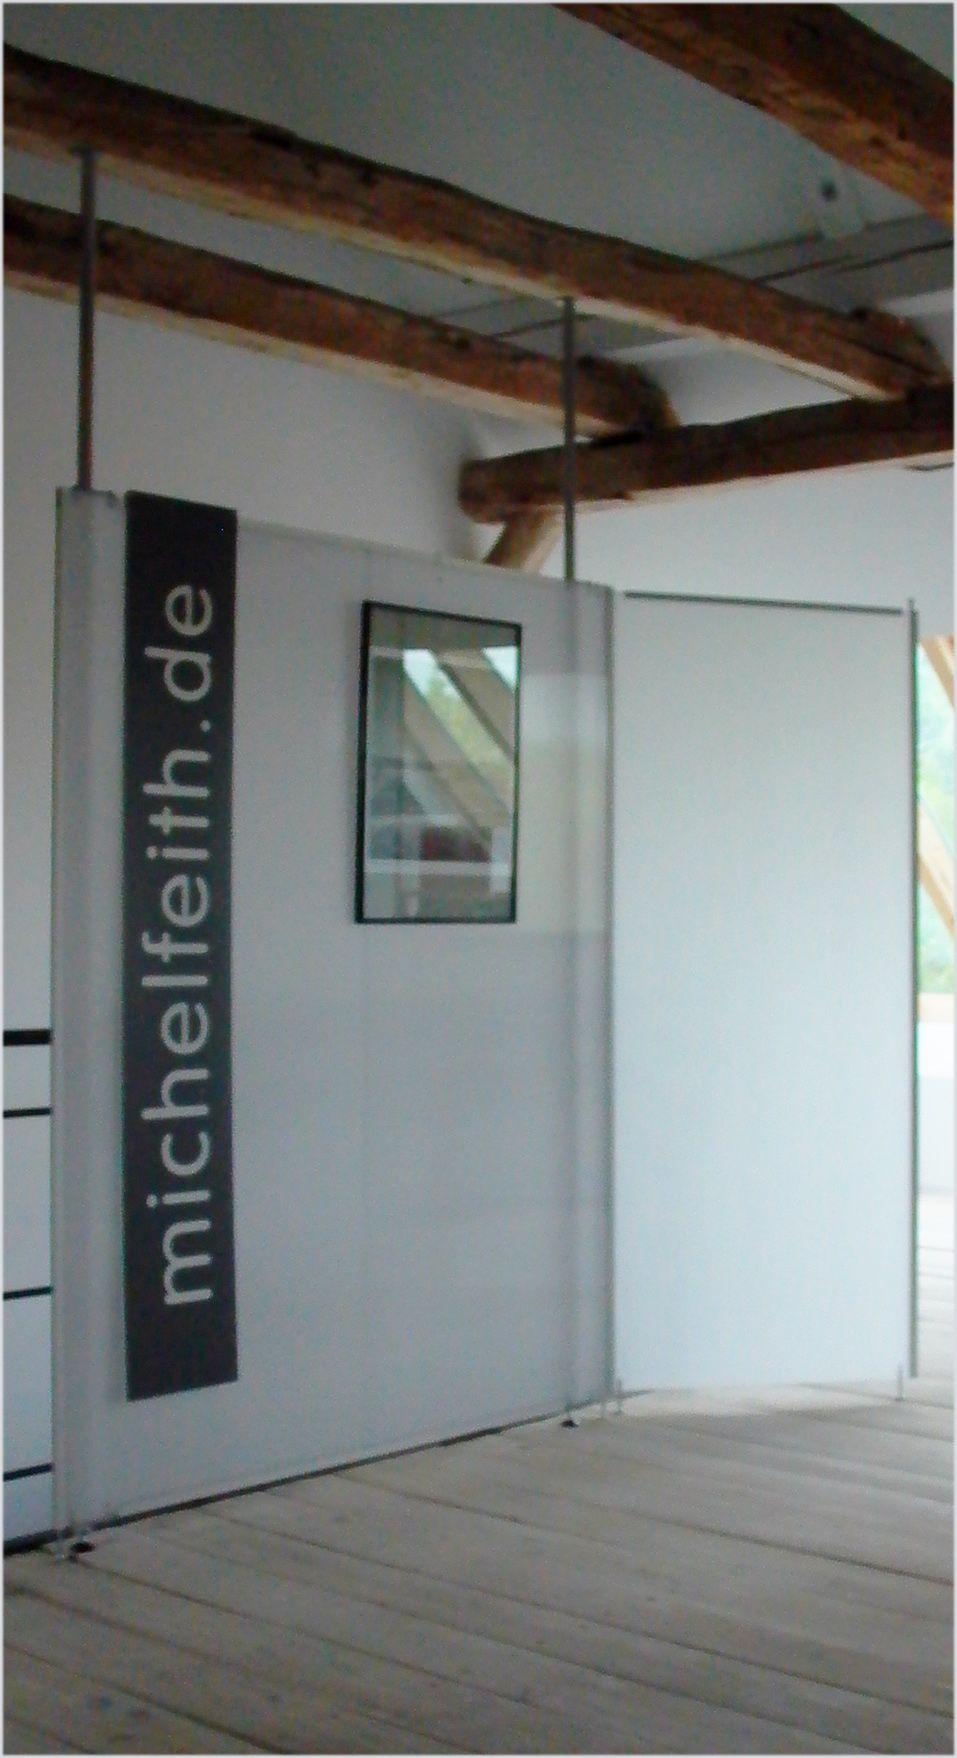 Raumteiler Hamburg raumteiler aus transluzentem polycarbonat material leicht möbel